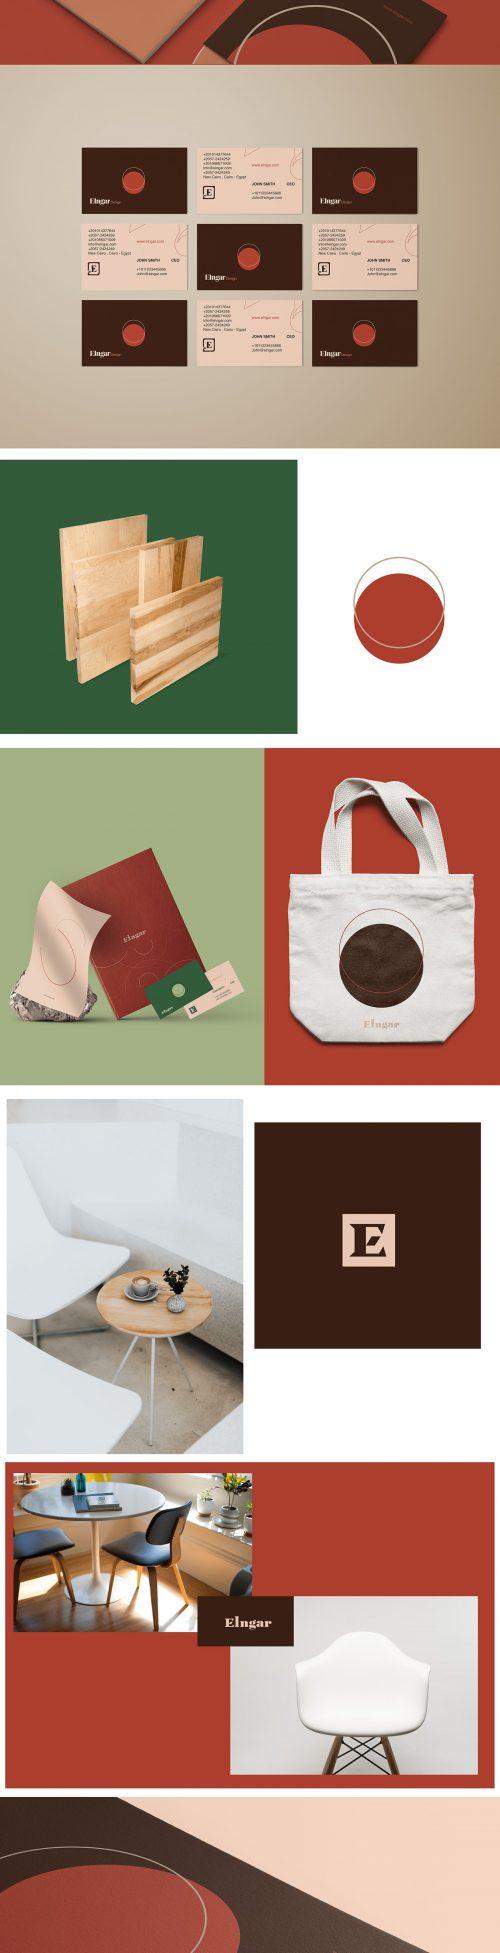 Elngar Furniture Brand Identity Branding Layout Design